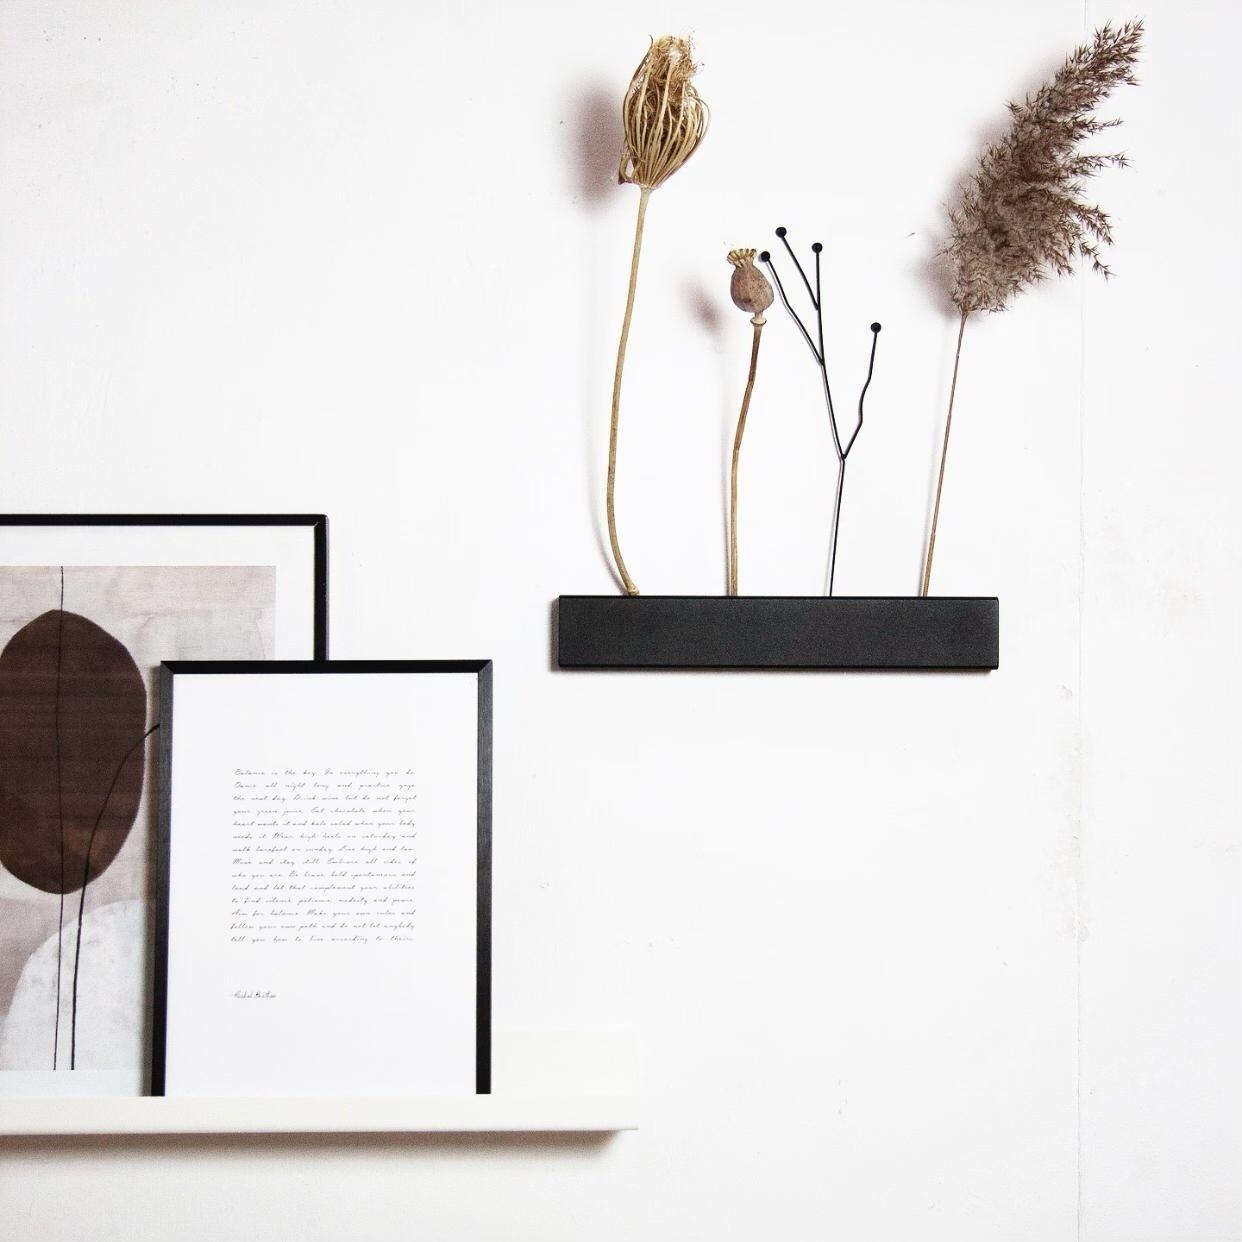 Stoer Metaal  flower holder for on the wall